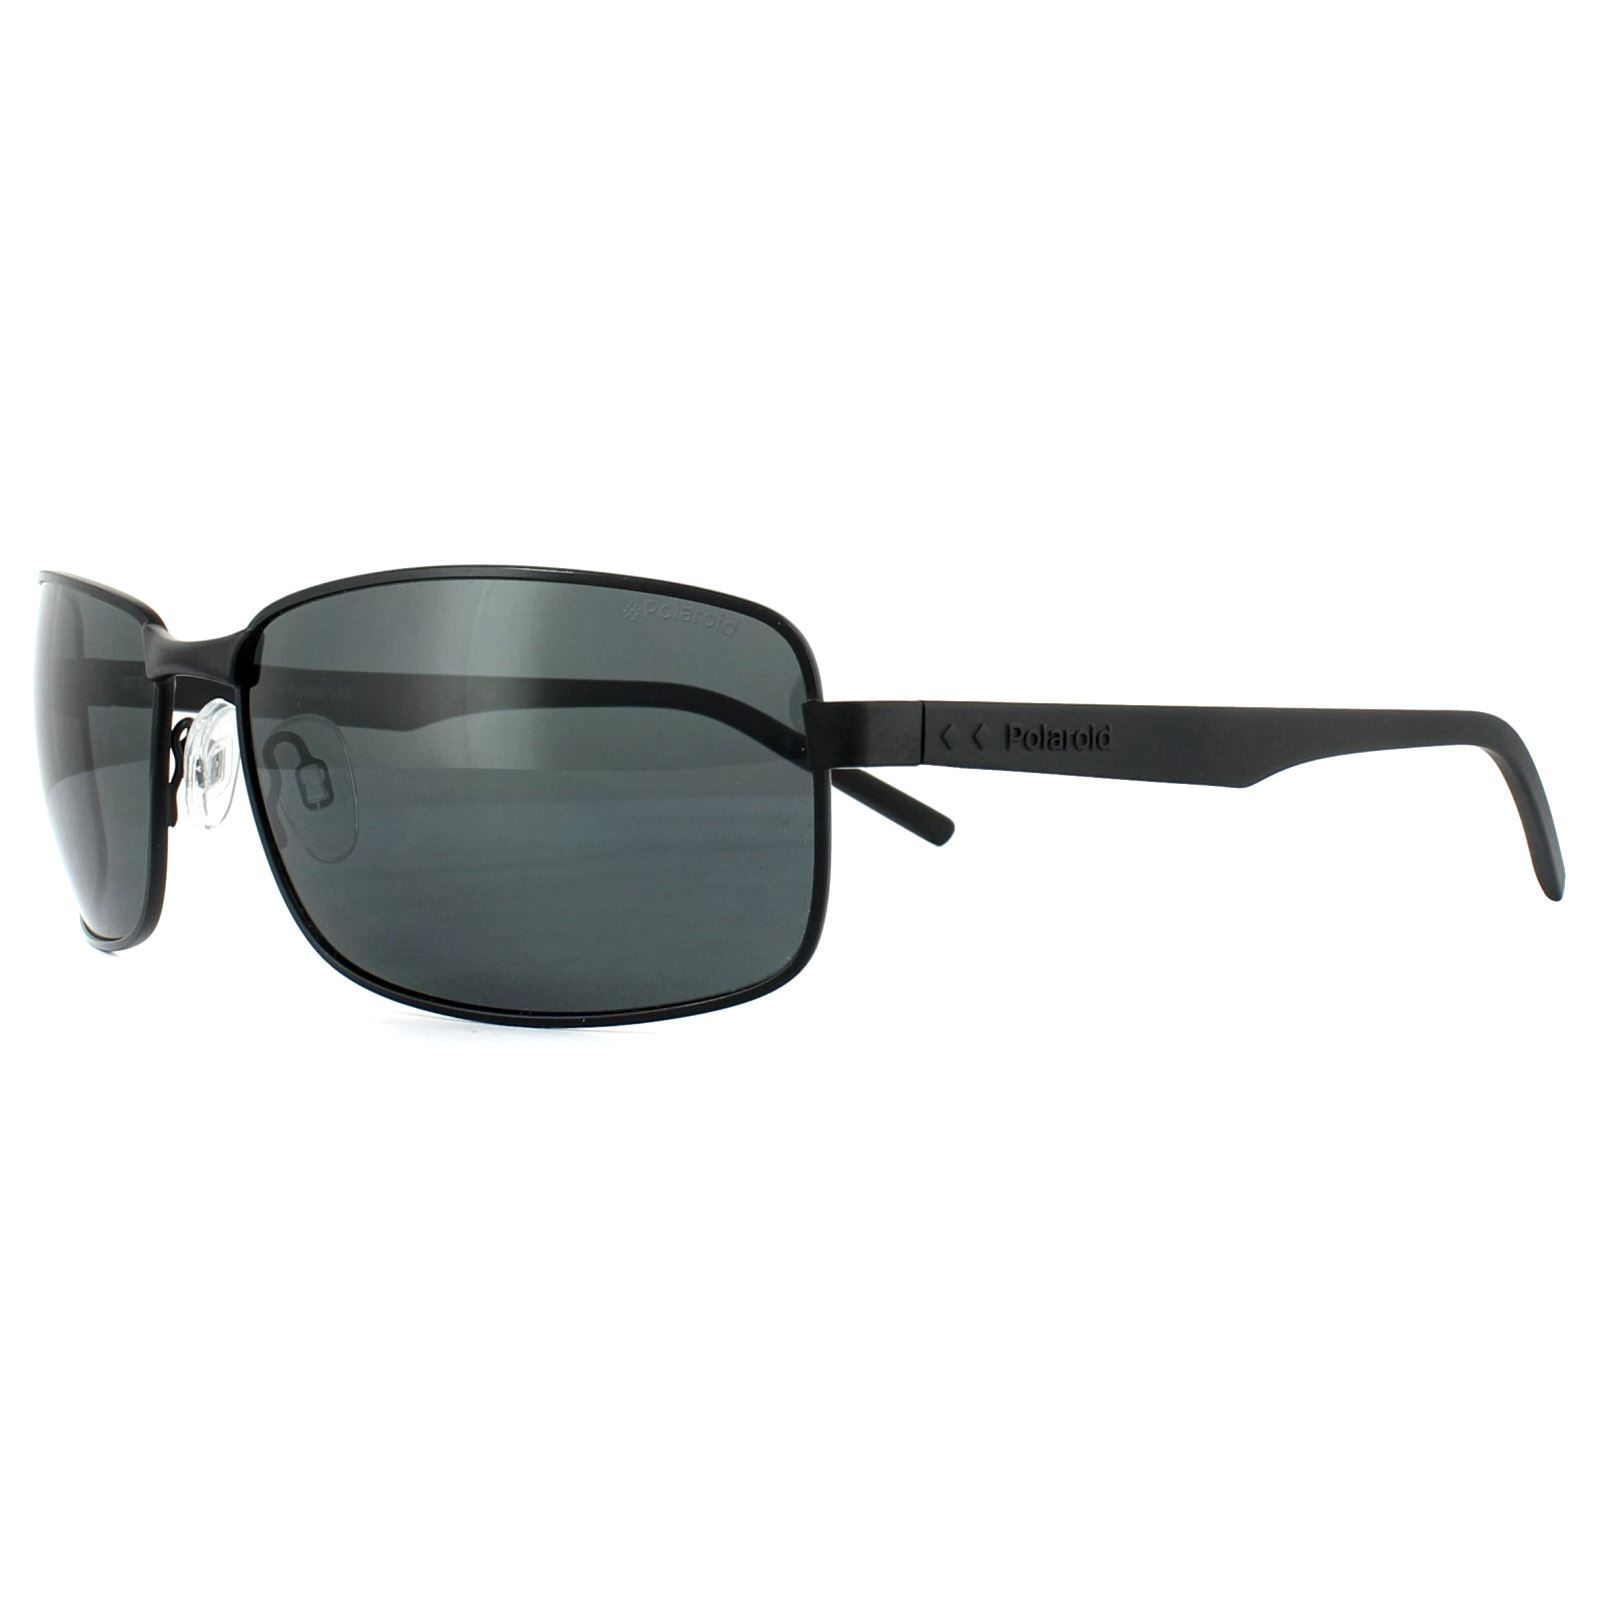 Polaroid Sunglasses PLD 2045/S 807 M9 Black Grey Polarized